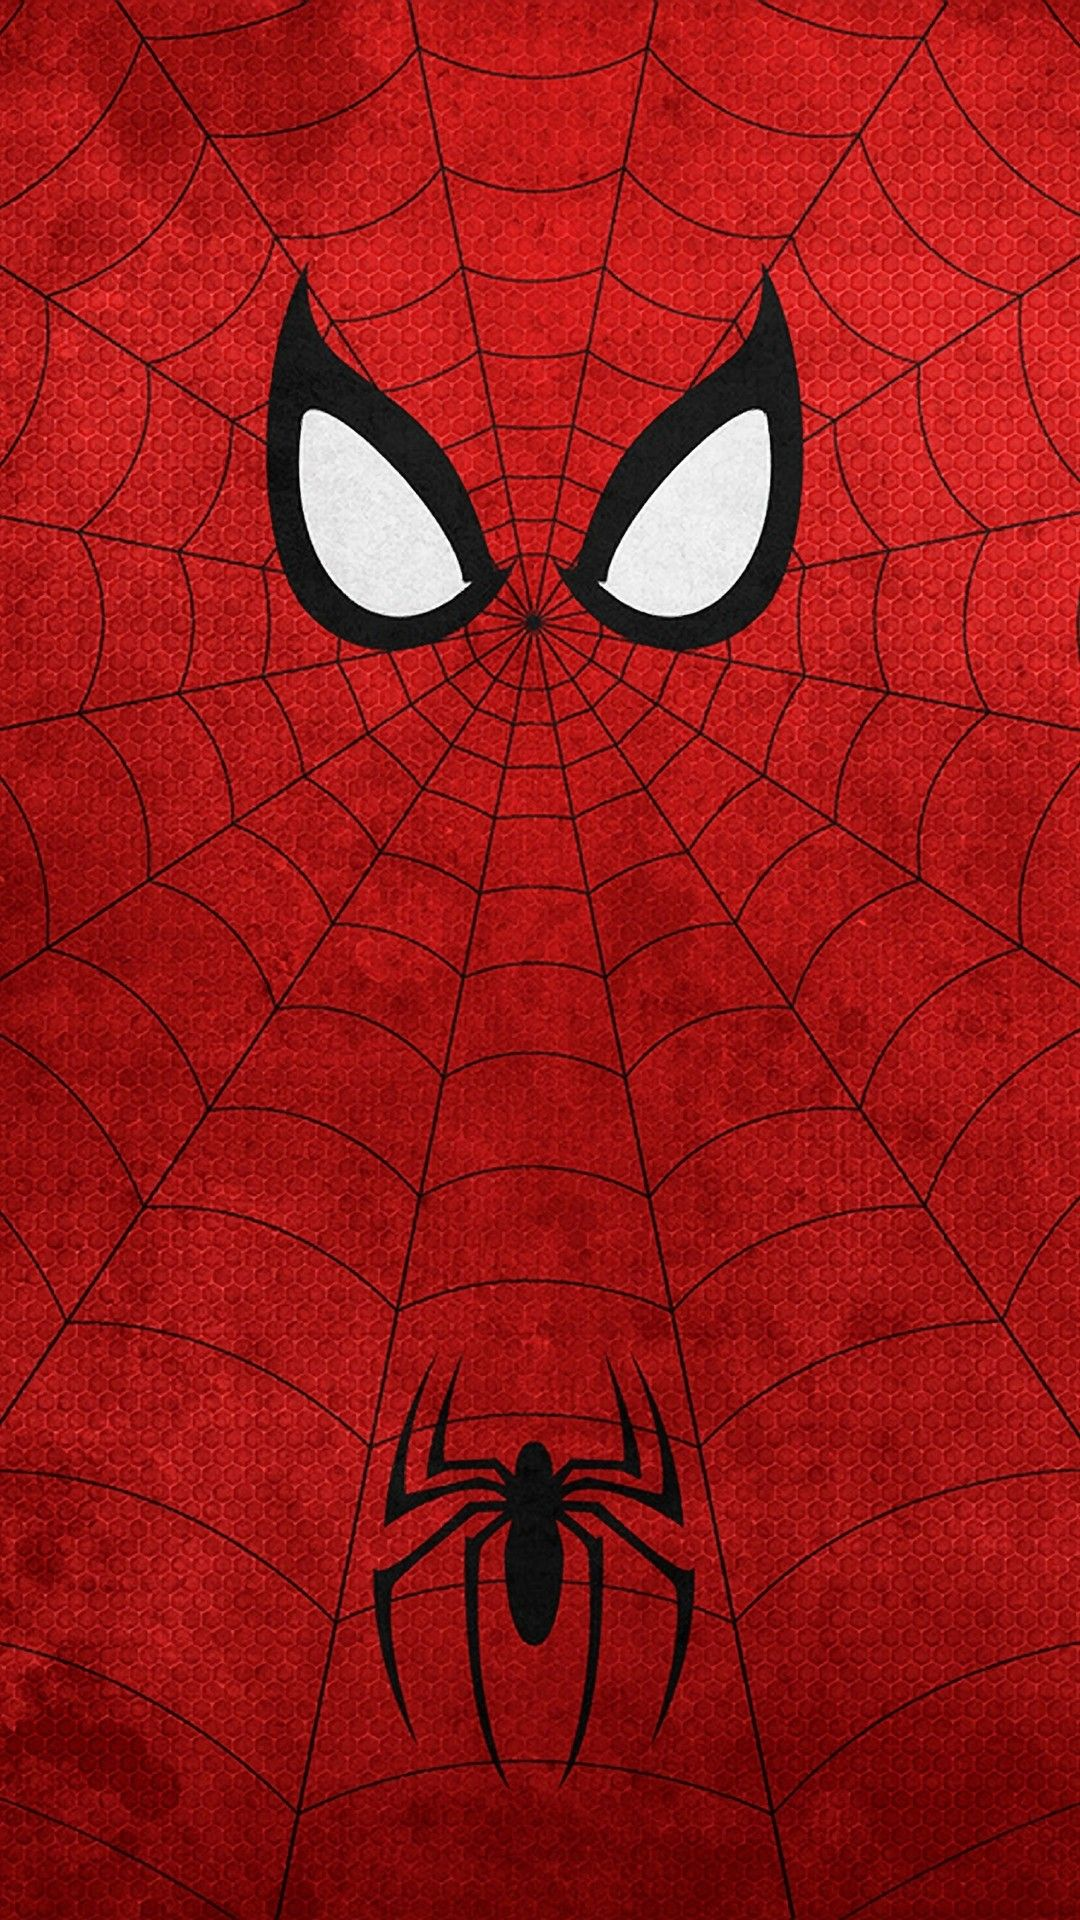 70 Best Free Superhero IPhone Wallpapers